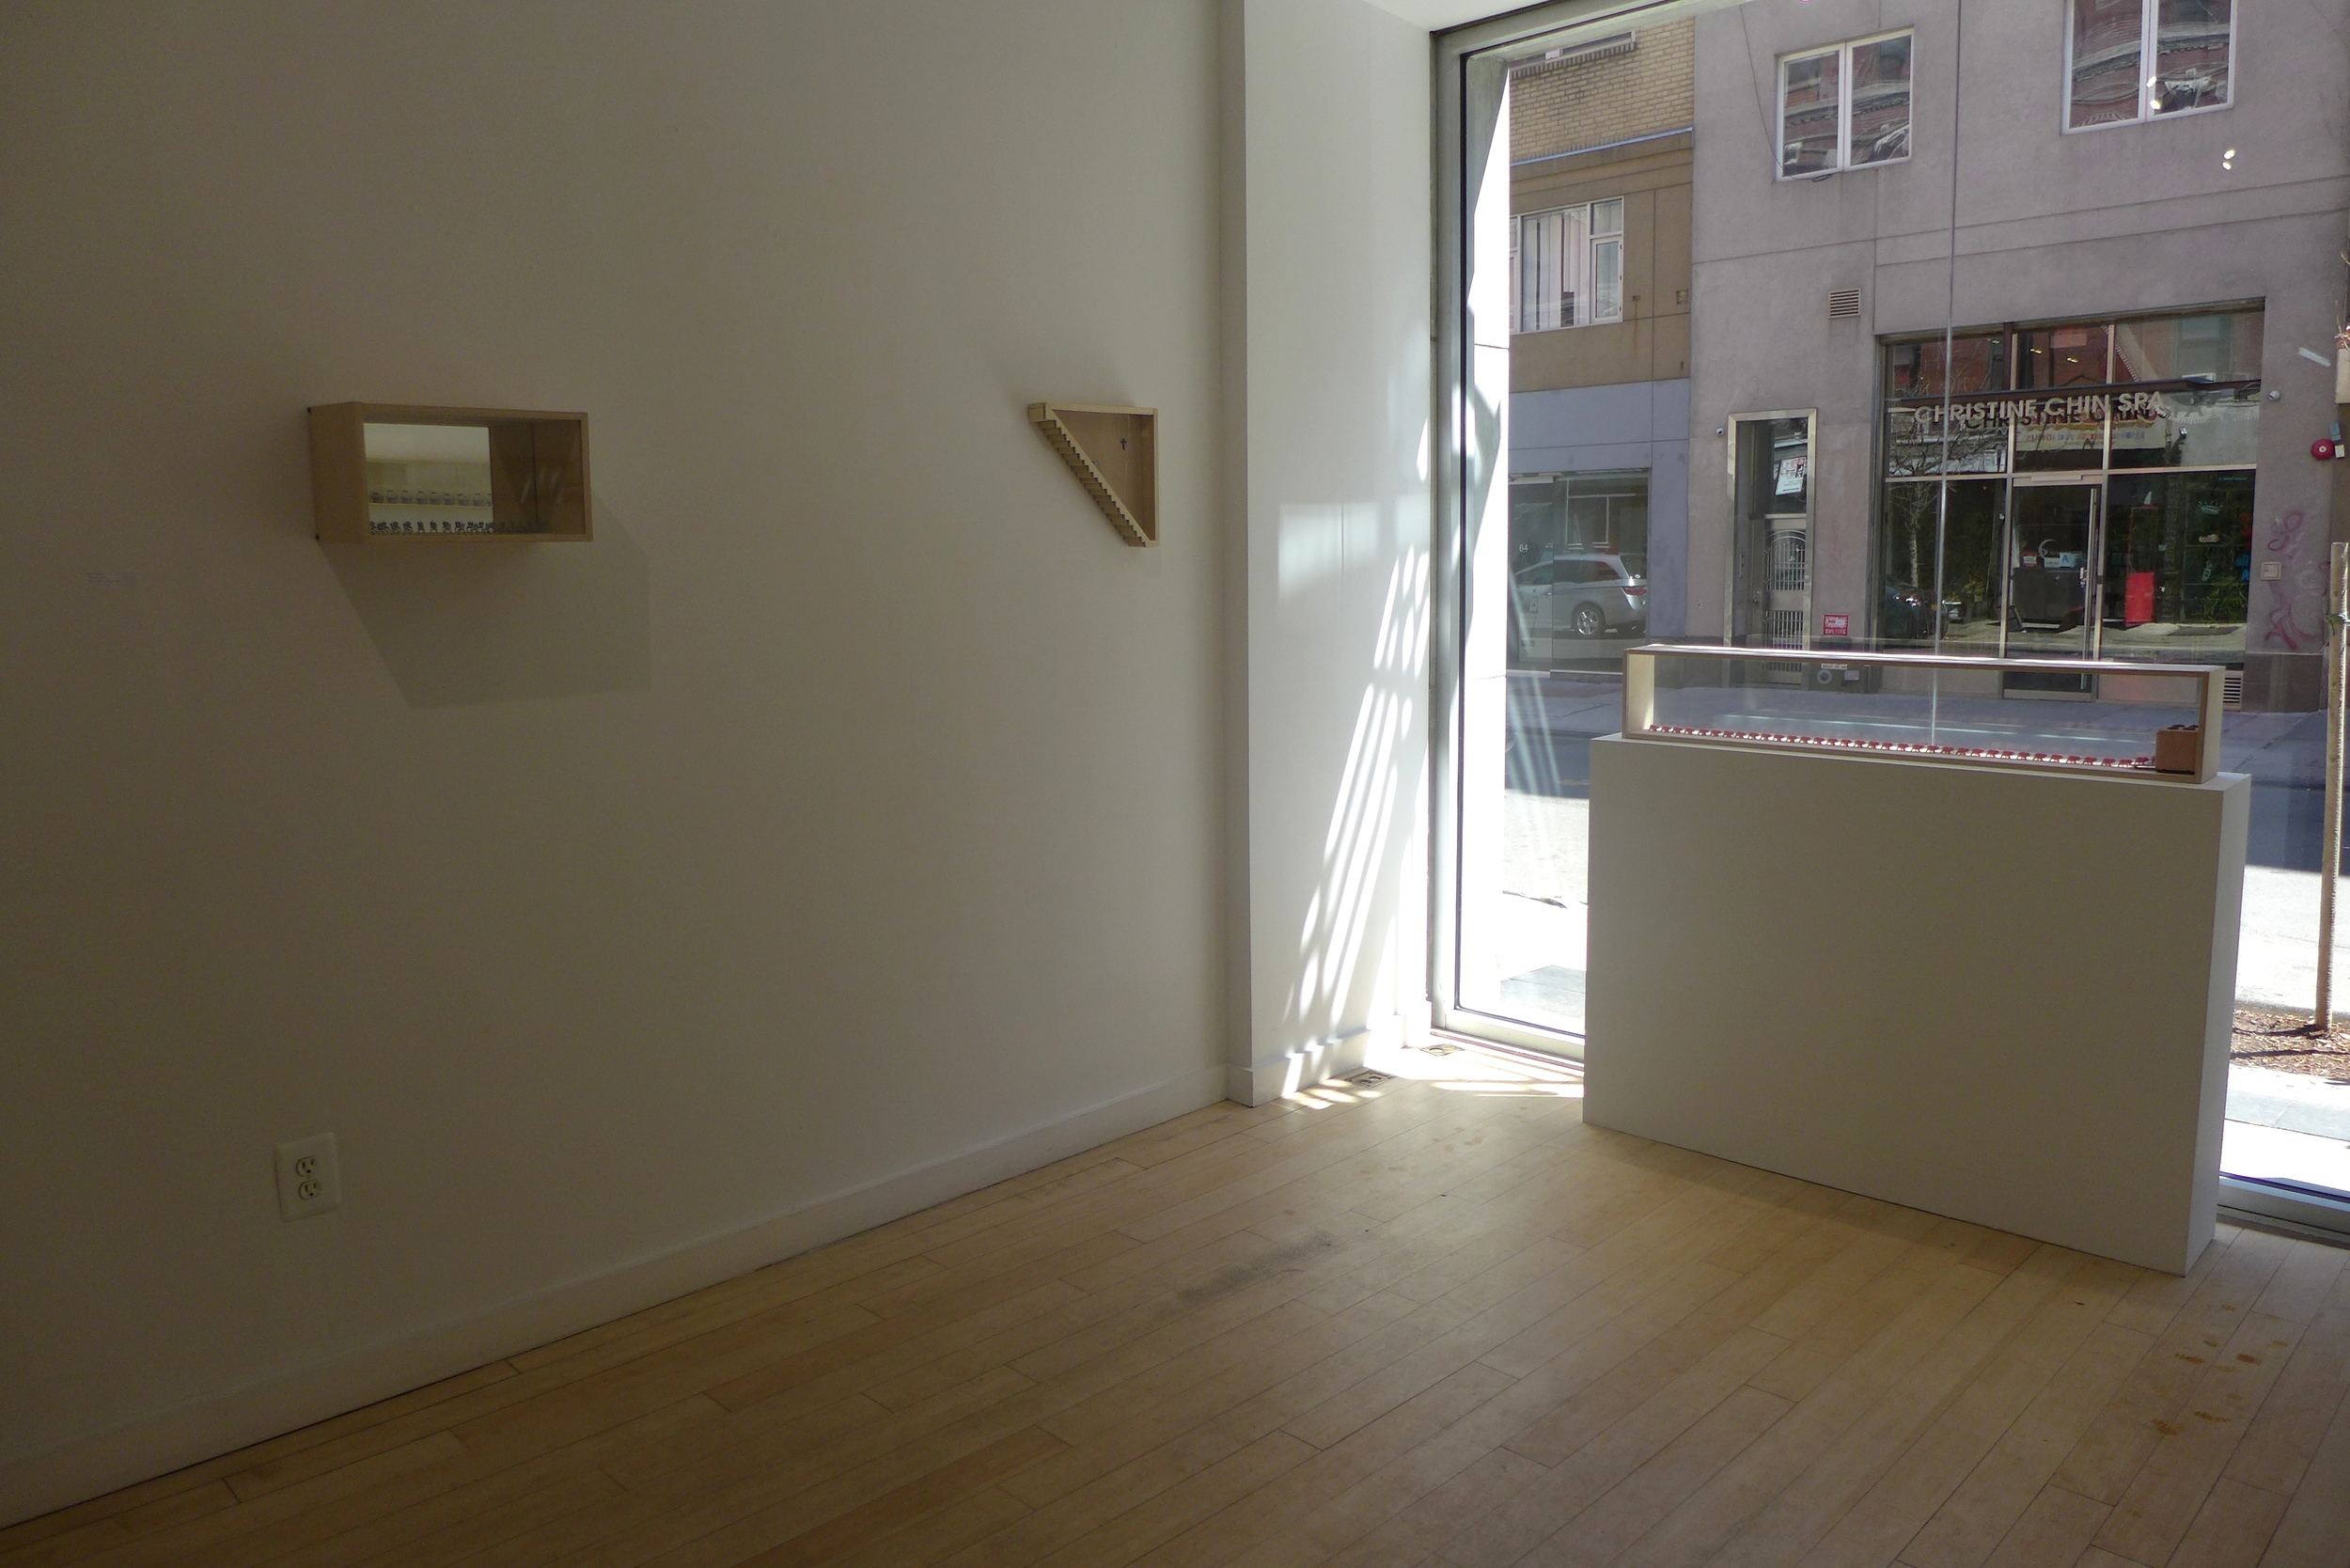 No Woman, No Cry exhibition view.